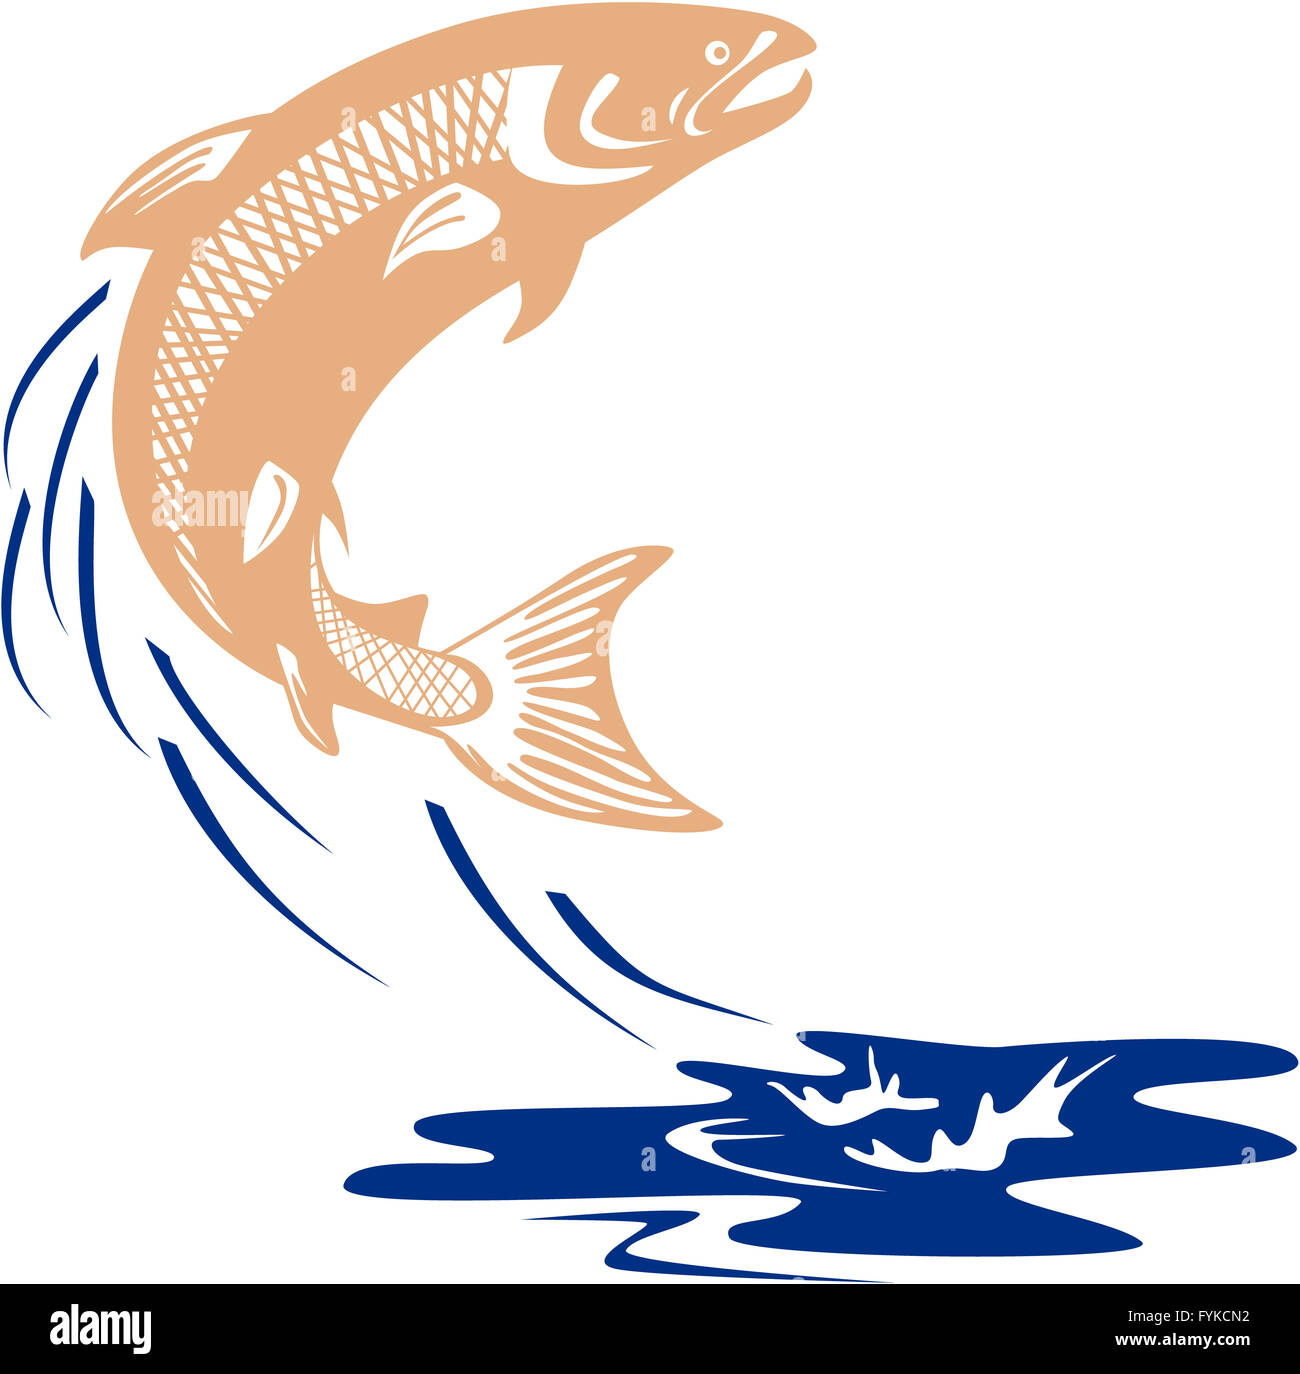 Freshwater fish jumping - Atlantic Salmon Fish Jumping Water Isolated